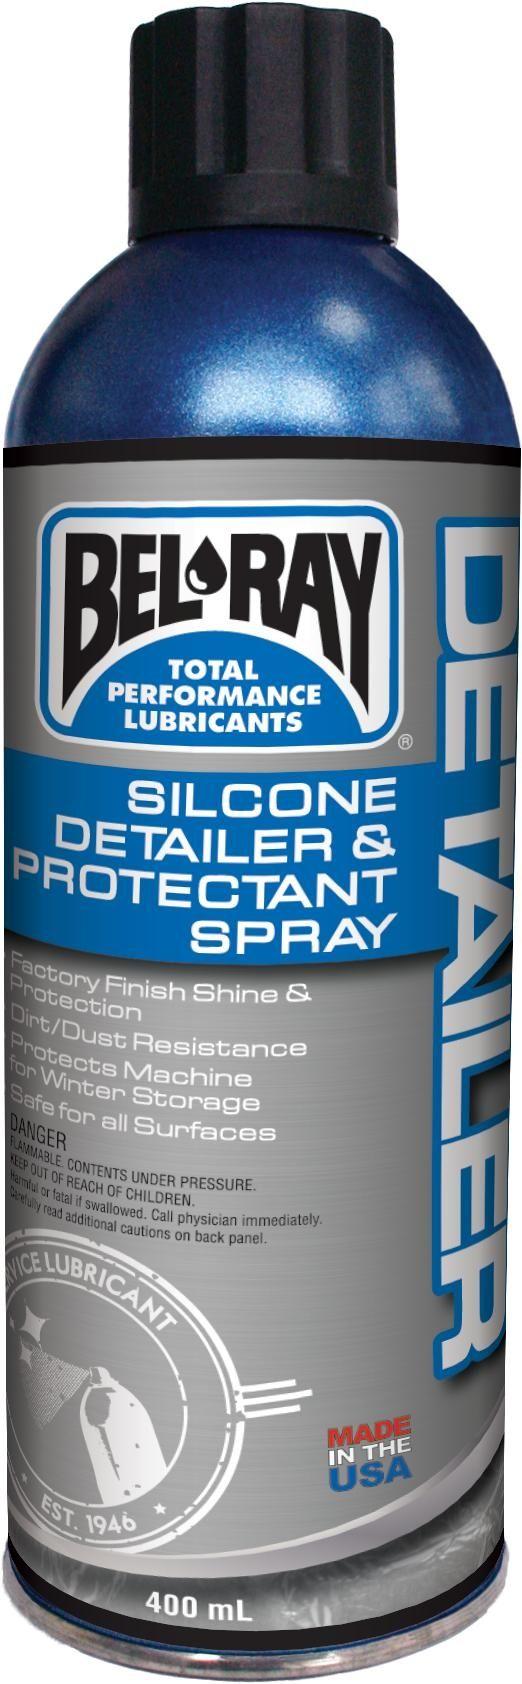 Bel-Ray Siliconen Protectant Spray 400 ml